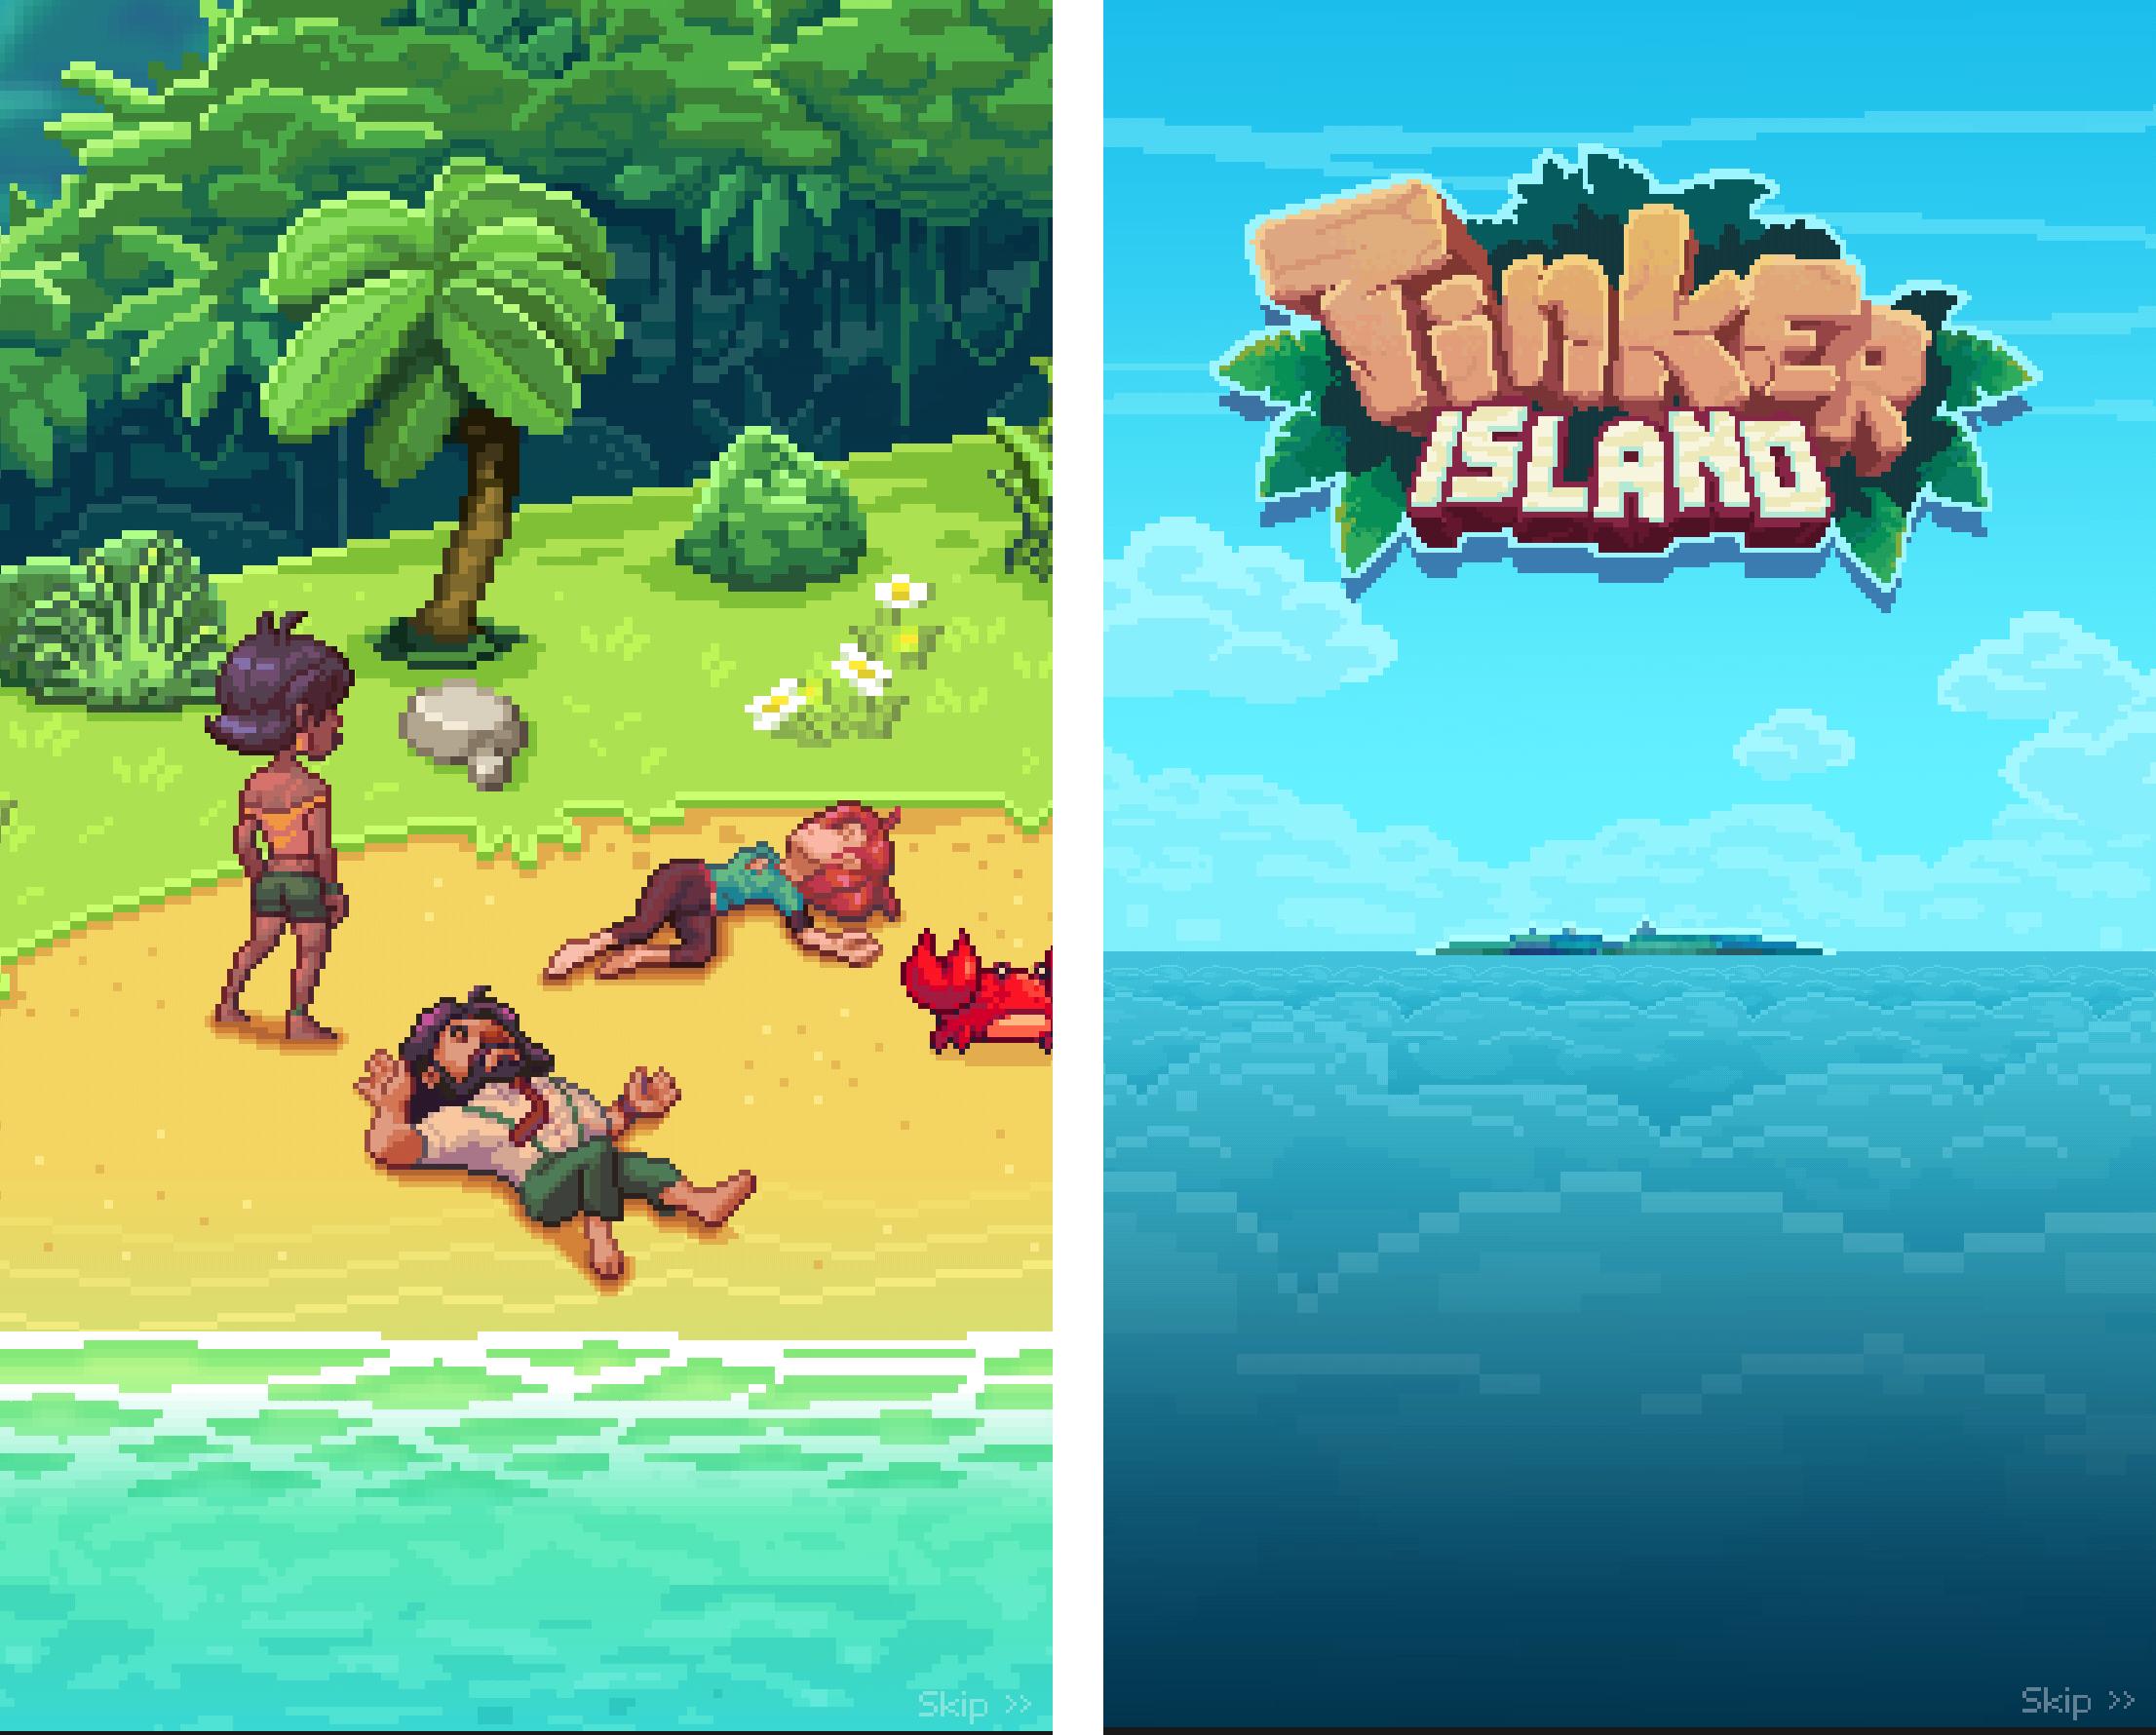 androidアプリ Tinker Island攻略スクリーンショット1